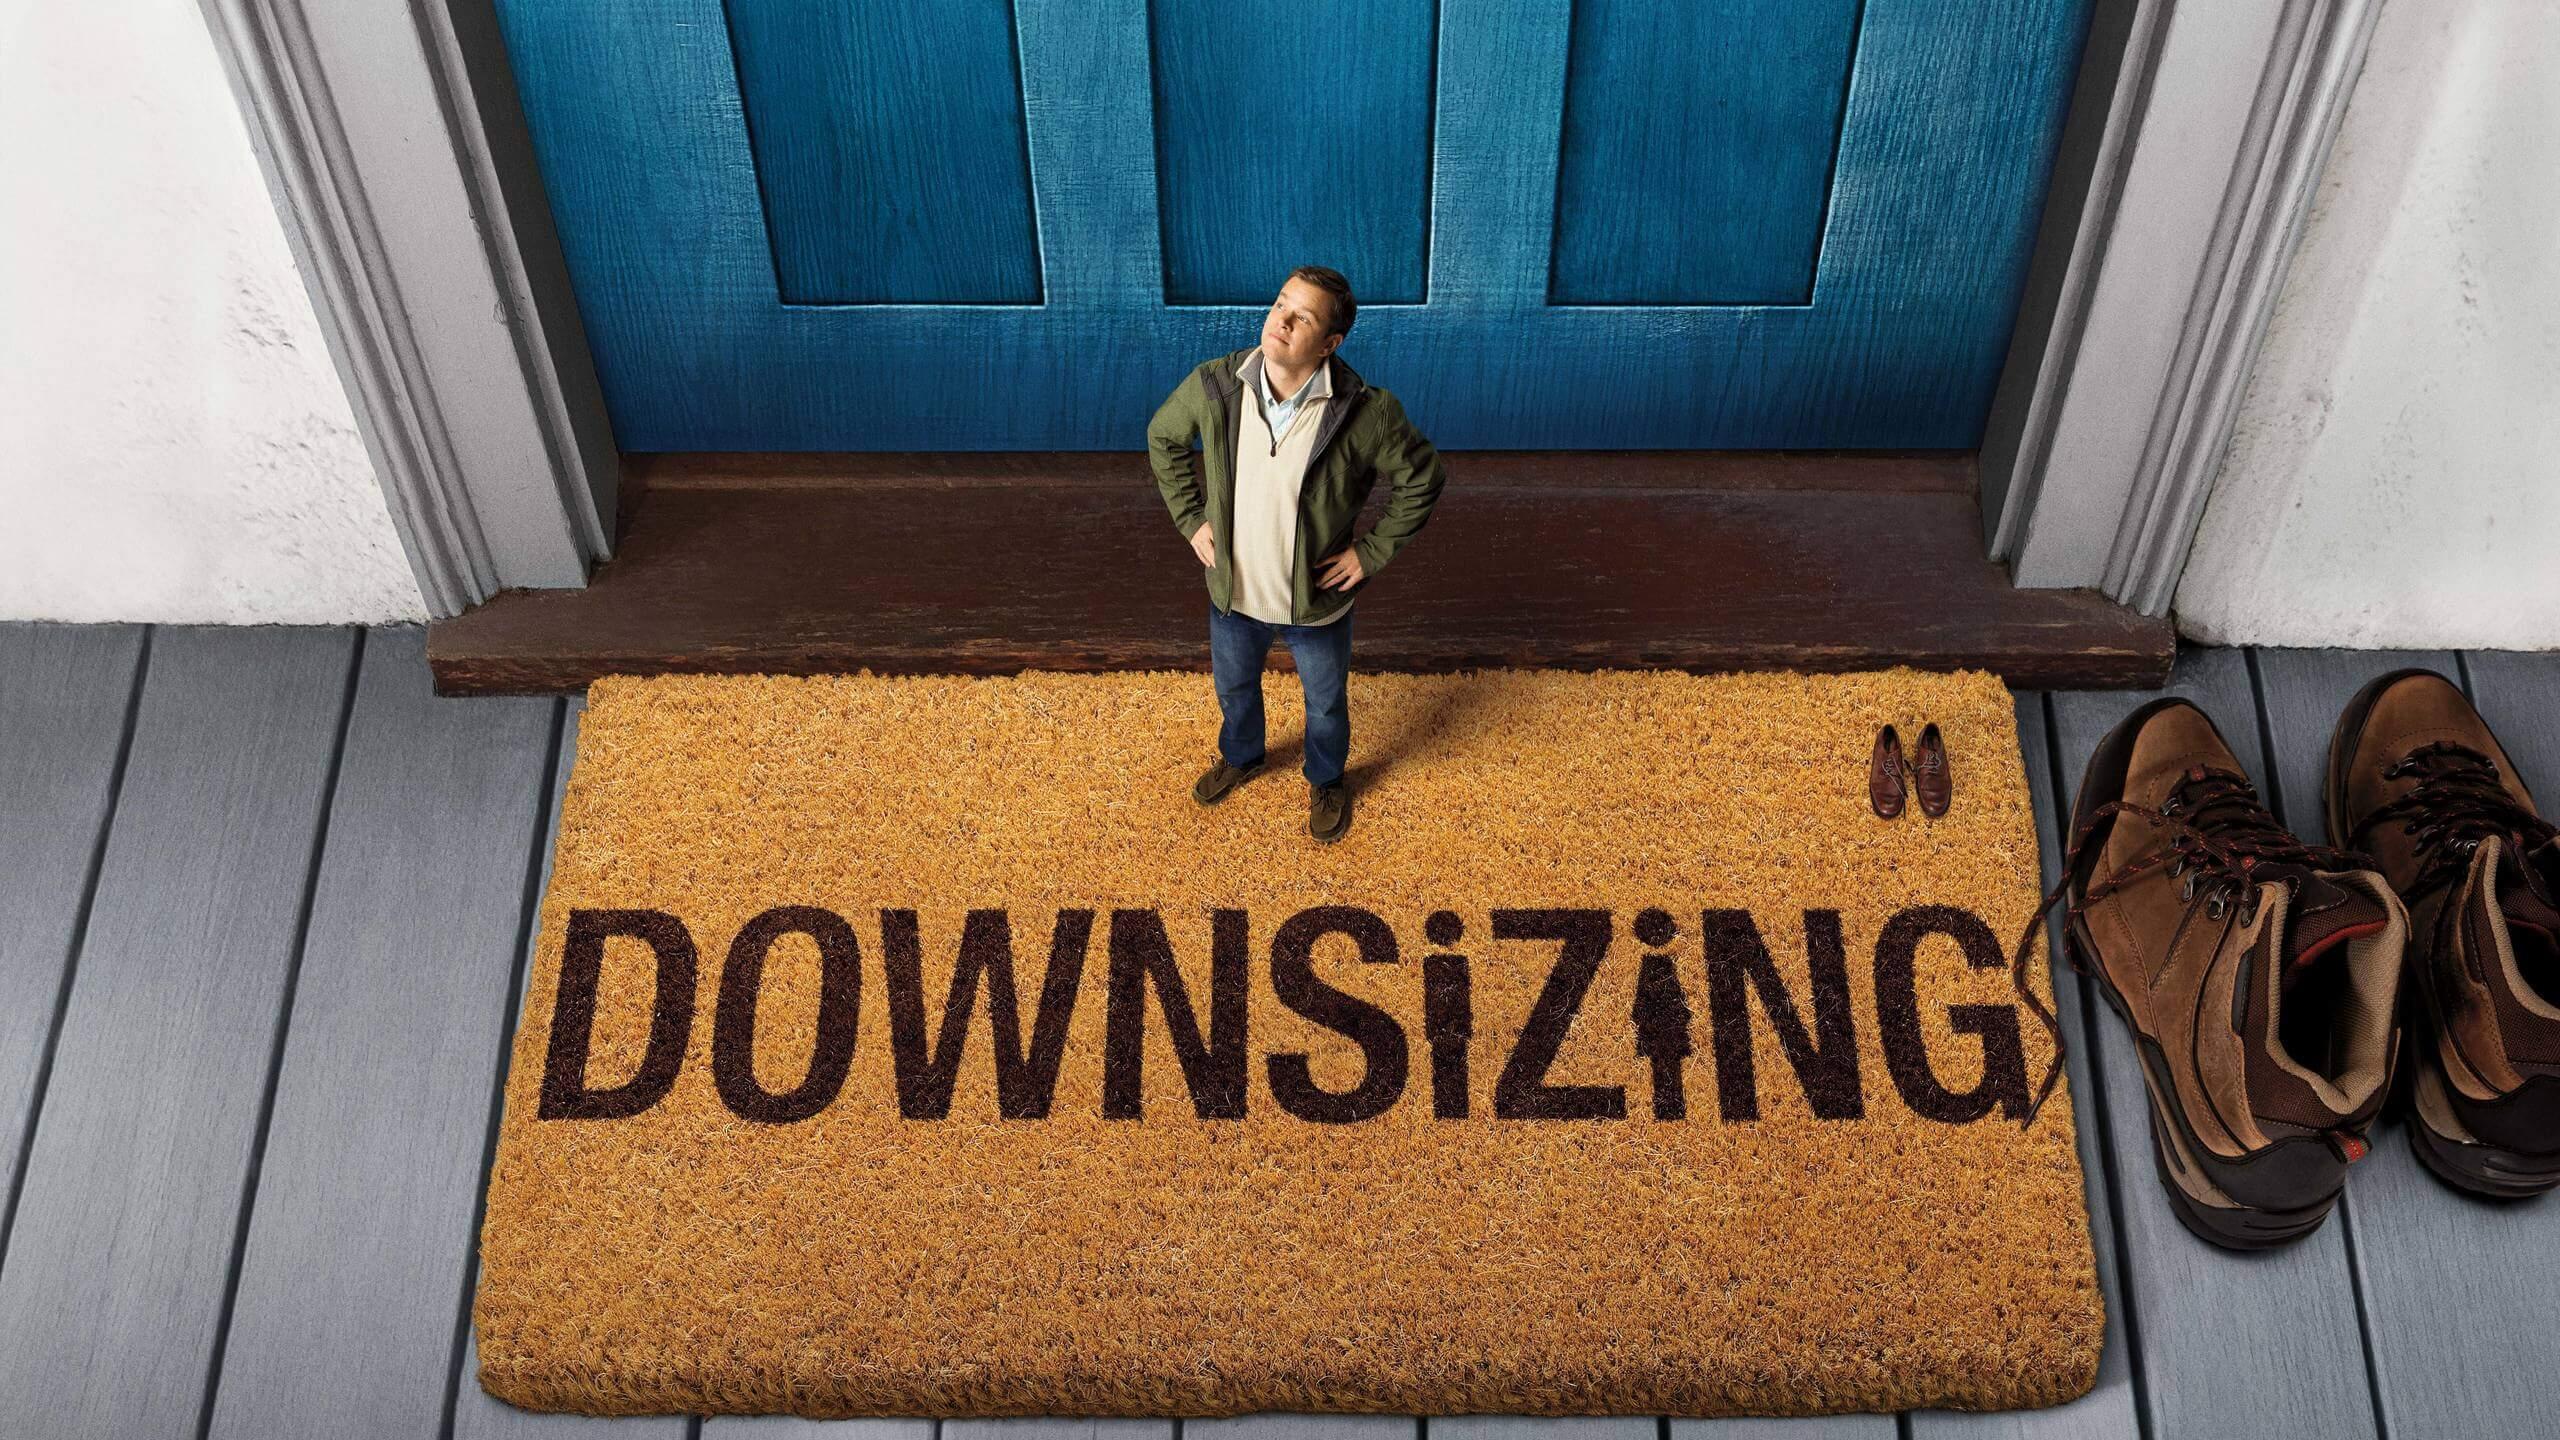 Downsizing anmeldelse